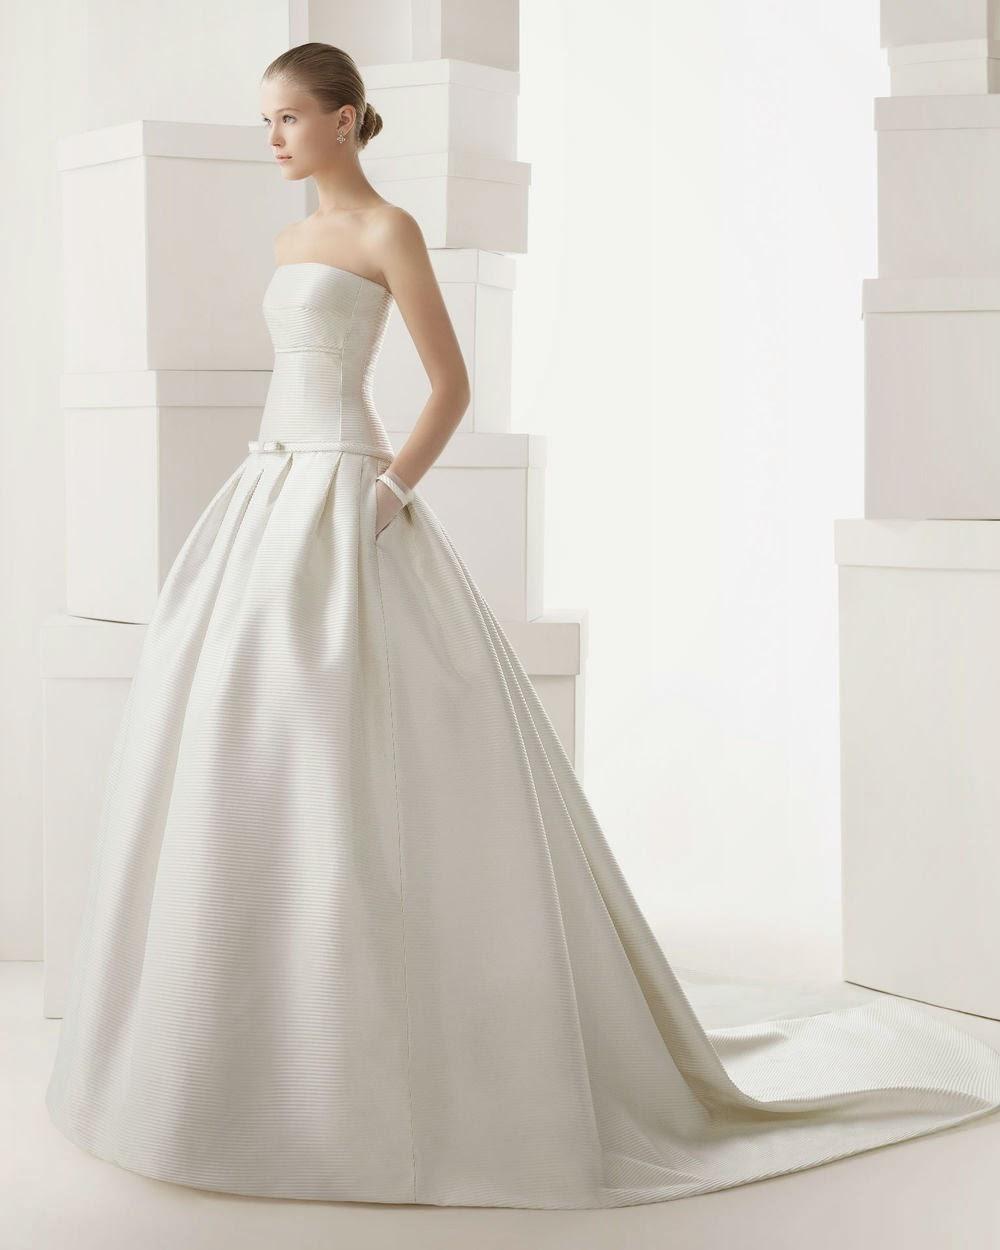 Tips On Choosing The Wedding Dress Body Shape